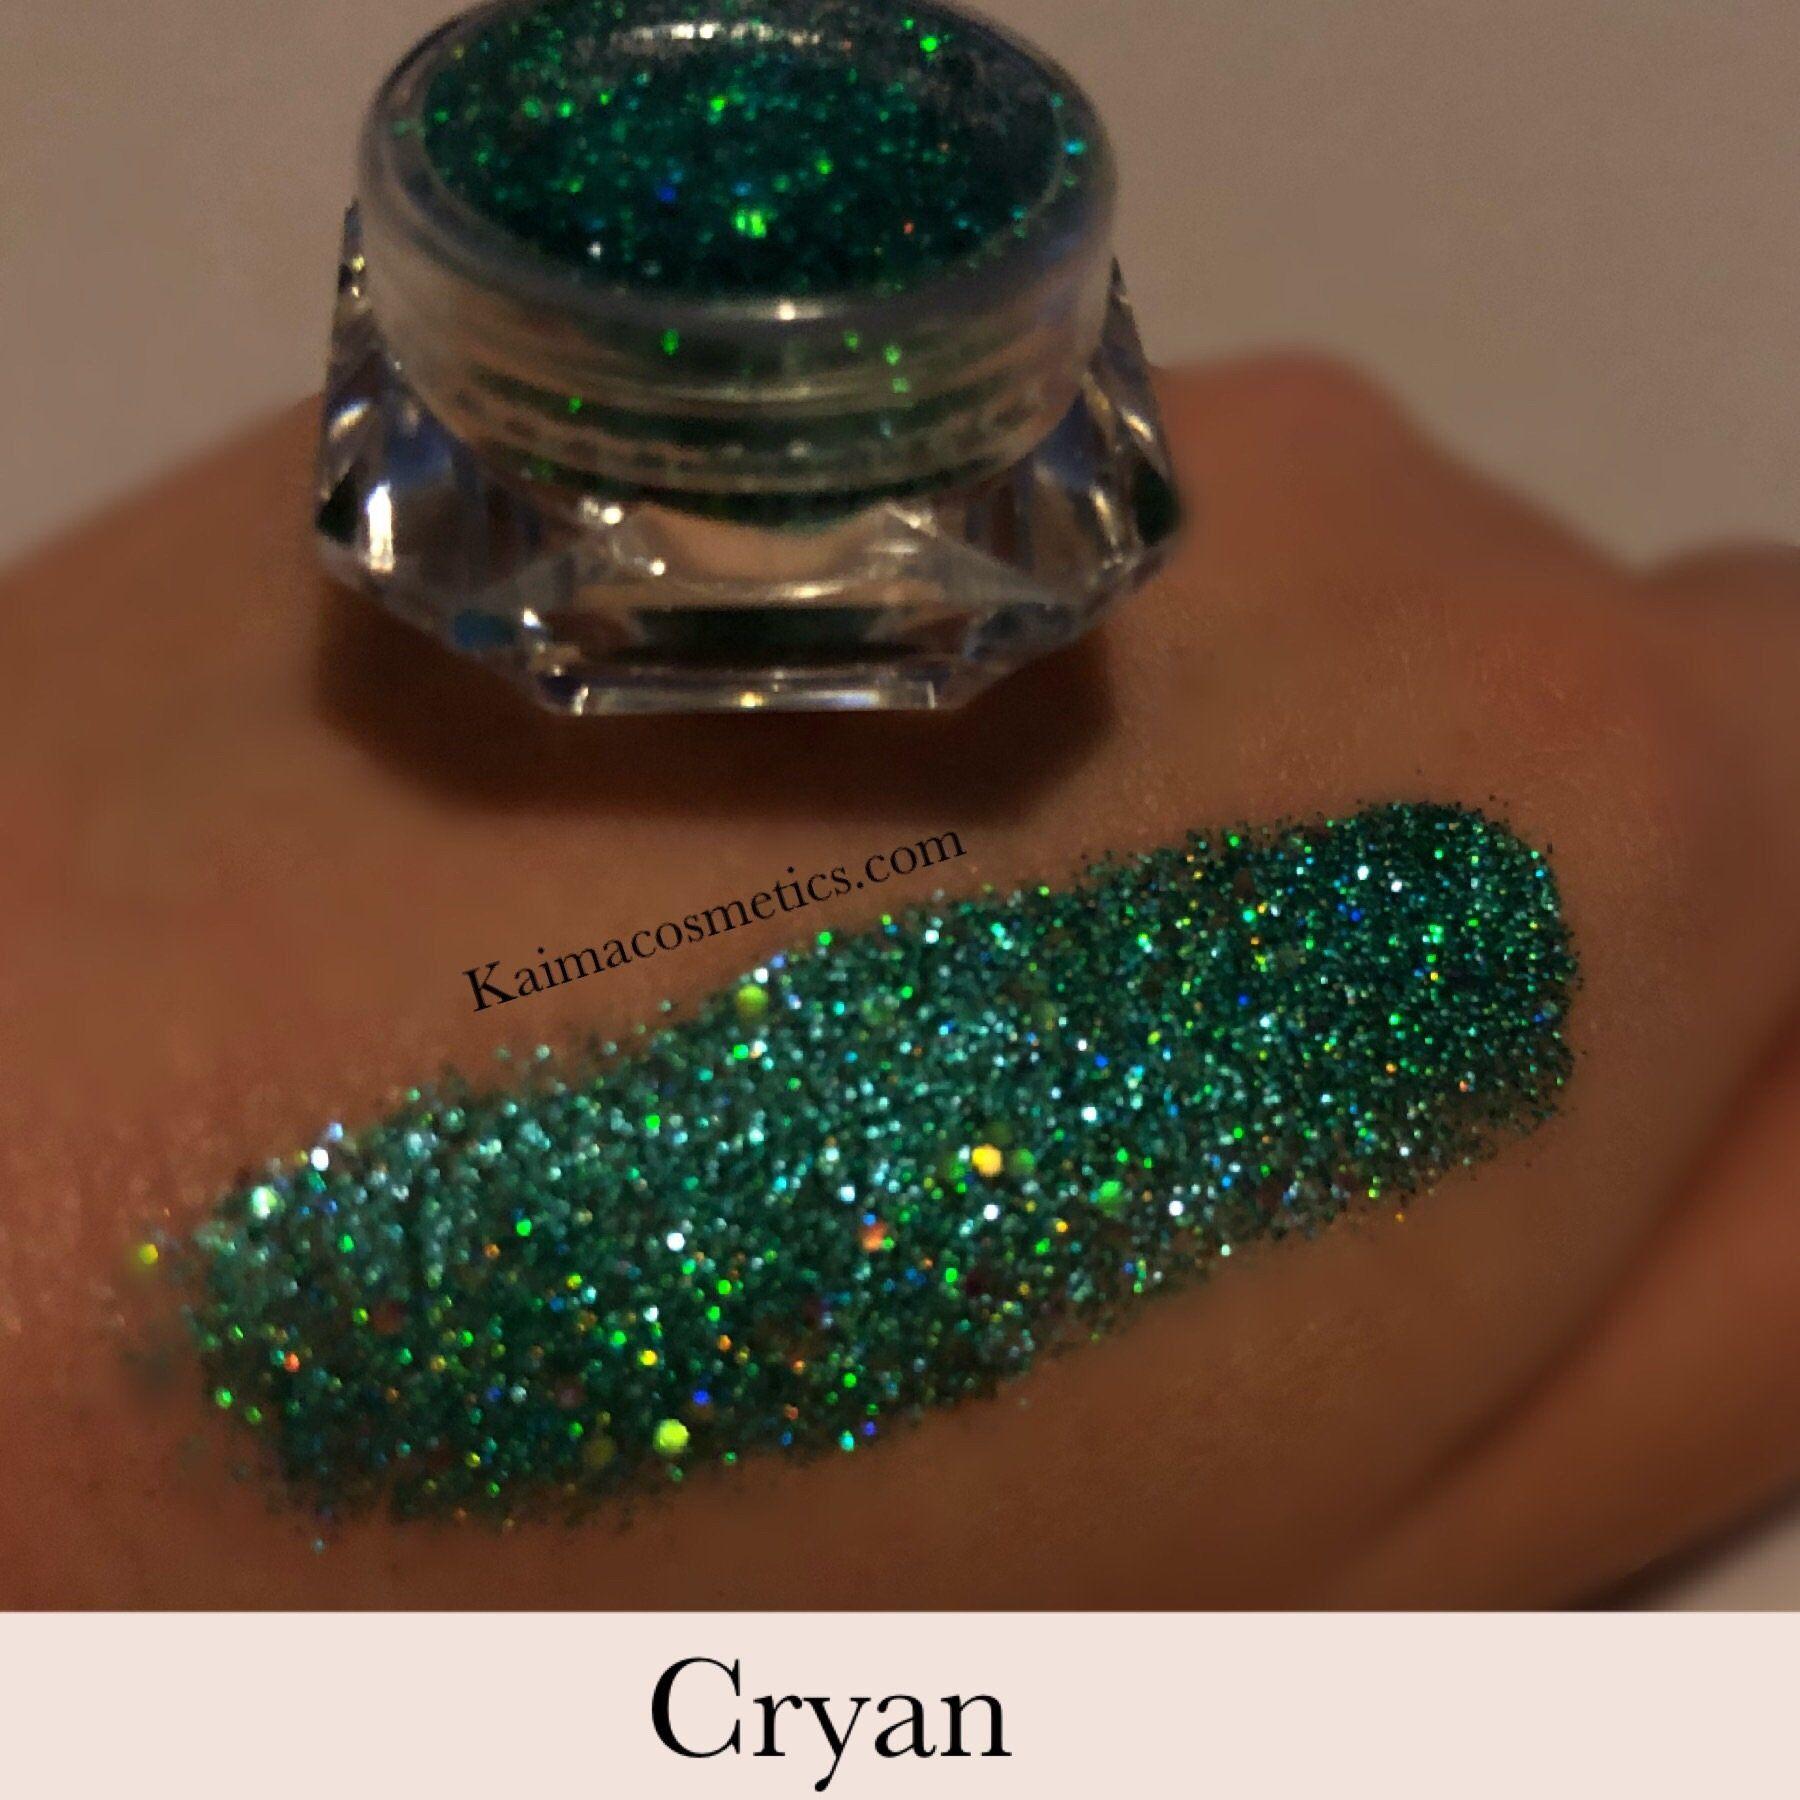 Loose Glitter Cryan Buy crueltyfree and vegan